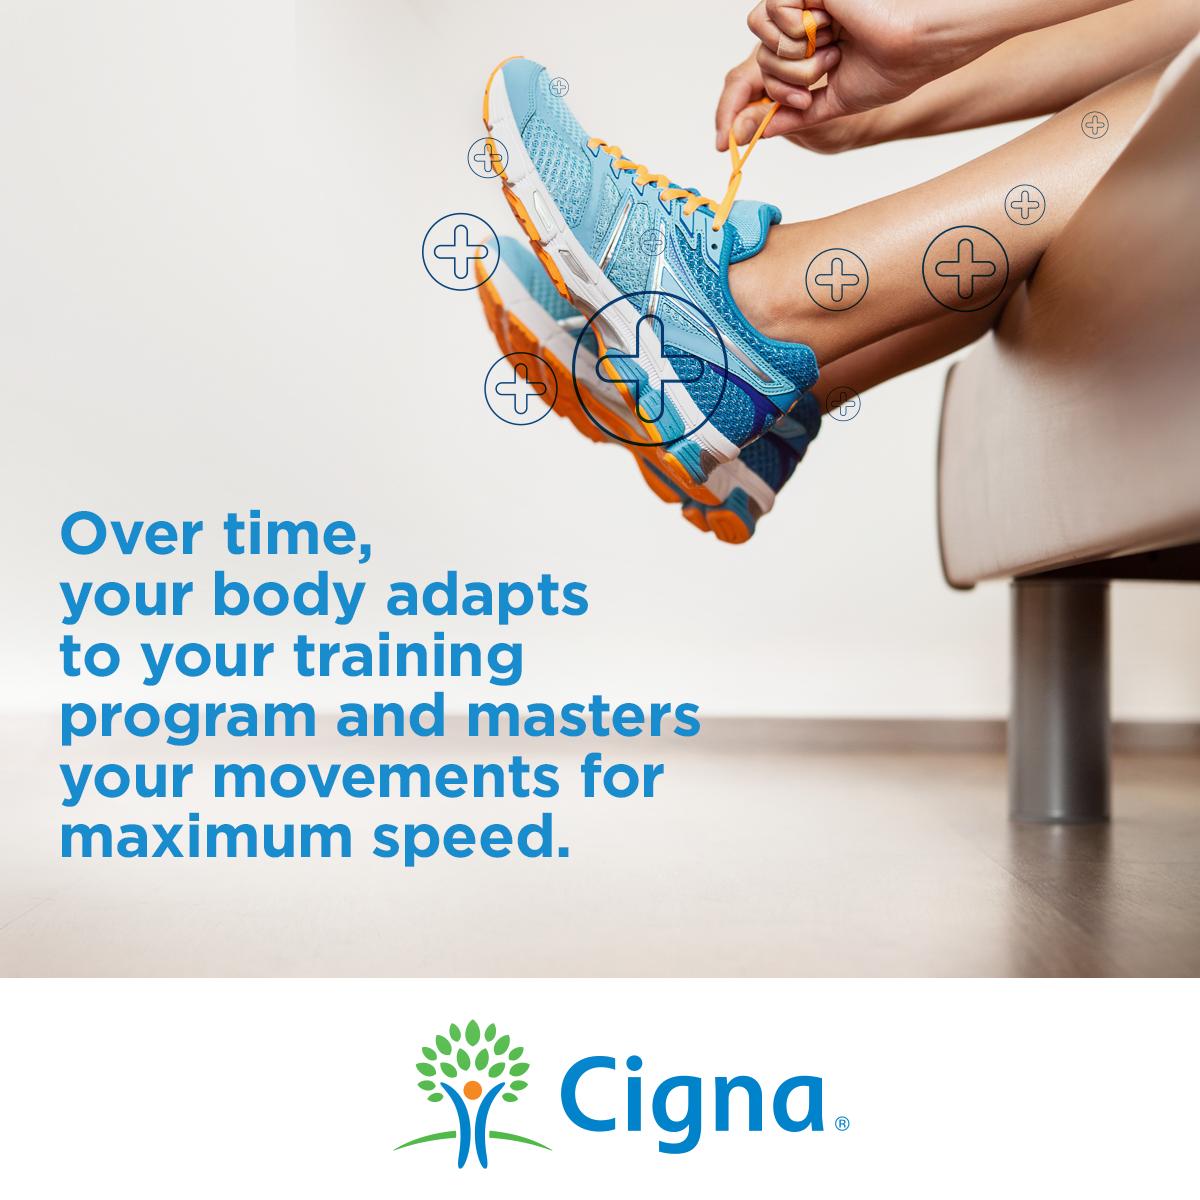 cigna-run-together-sleep